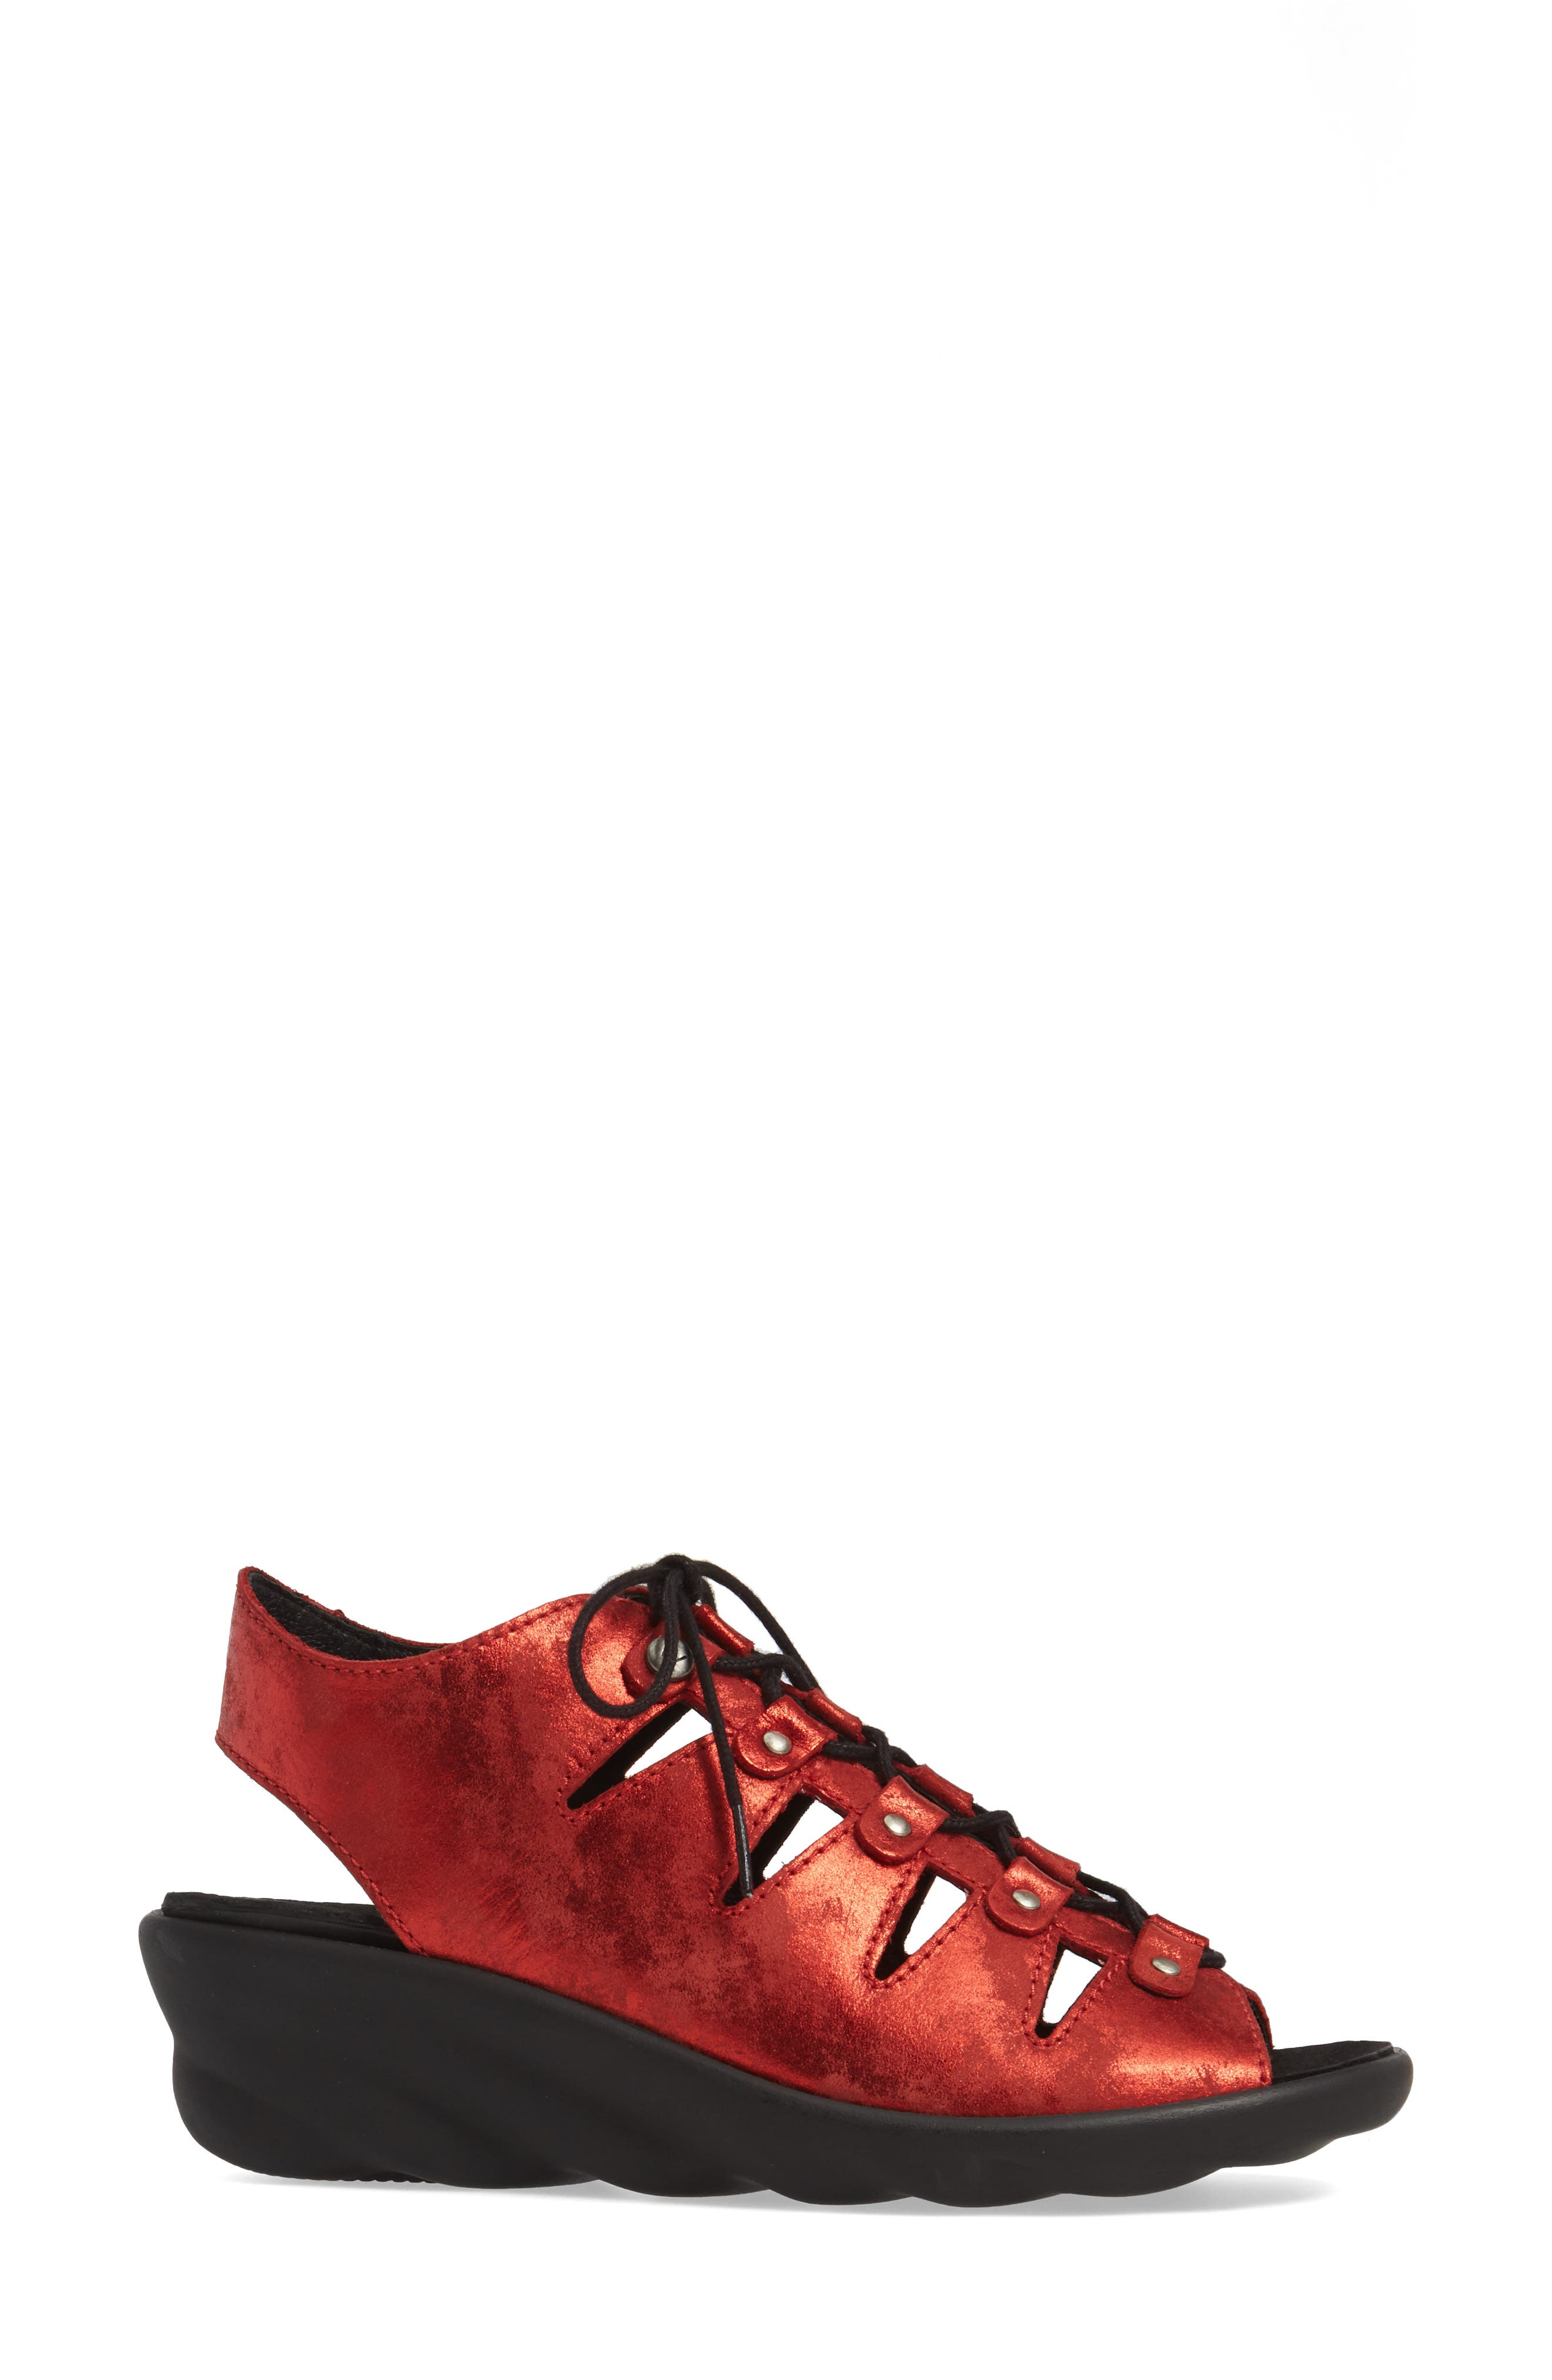 Alternate Image 3  - Wolky Arena Sandal (Women)